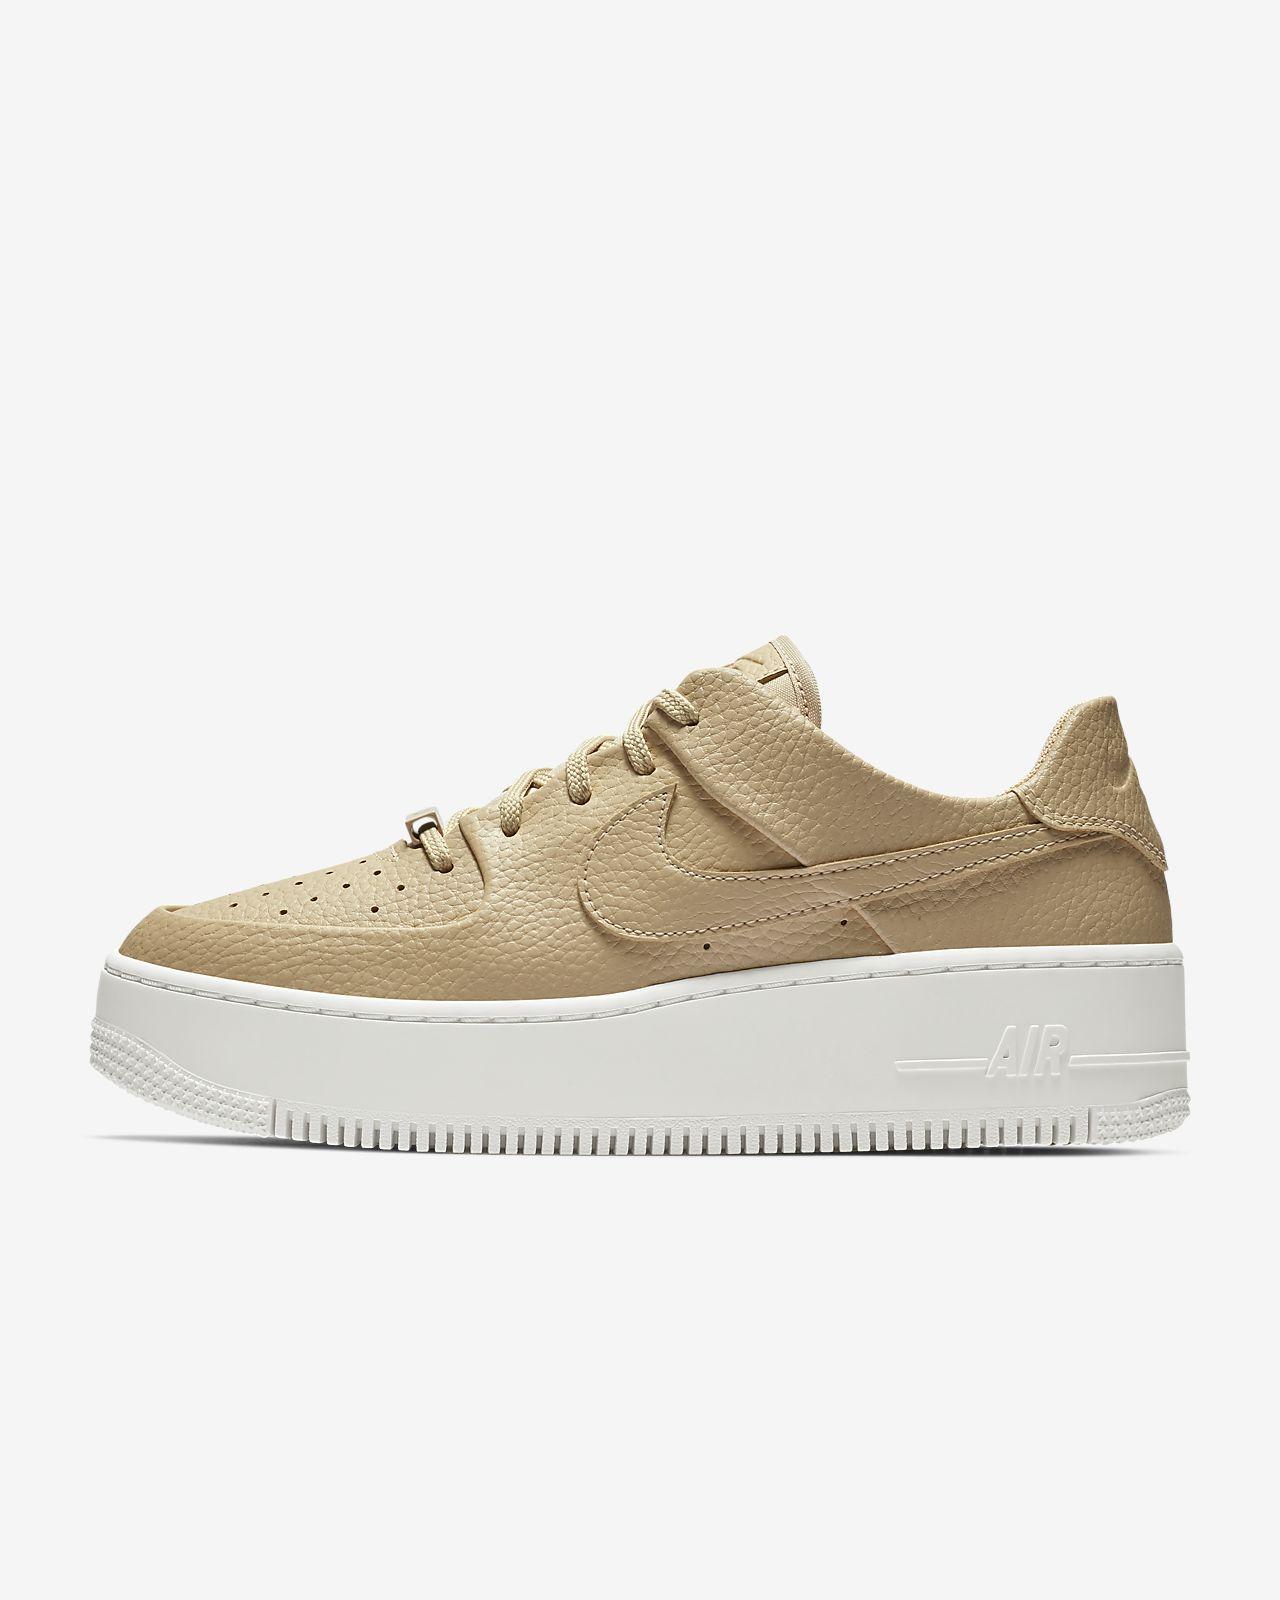 Calzado para mujer Nike Air Force 1 Sage Low